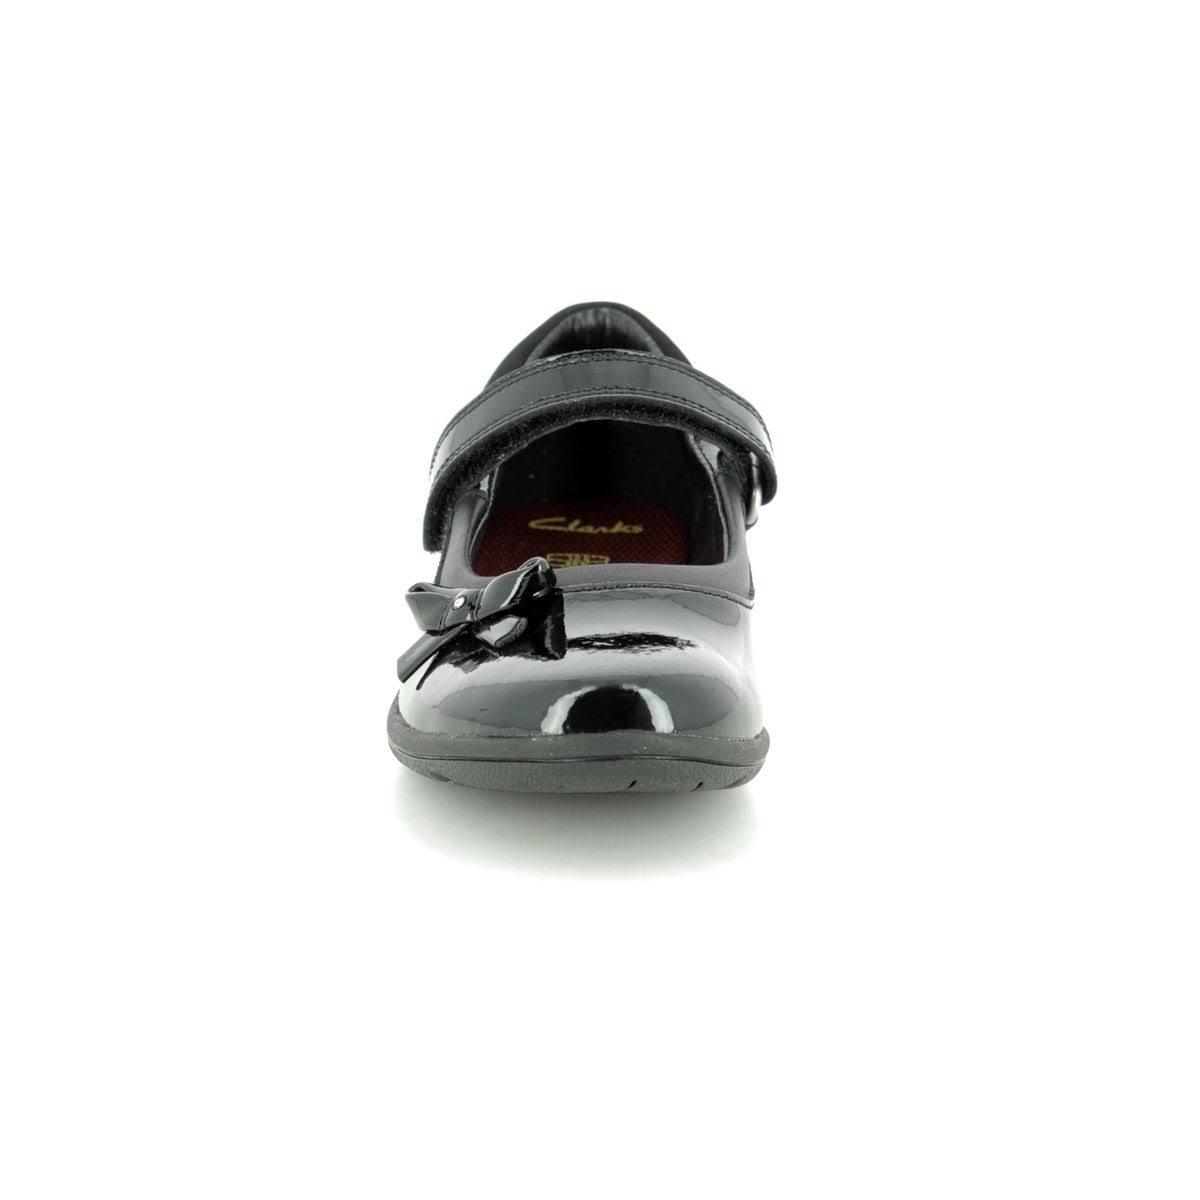 Black Patent Venture Jn School Shoes 3491 Kids 58h Clarks Star tdBhCQrxs